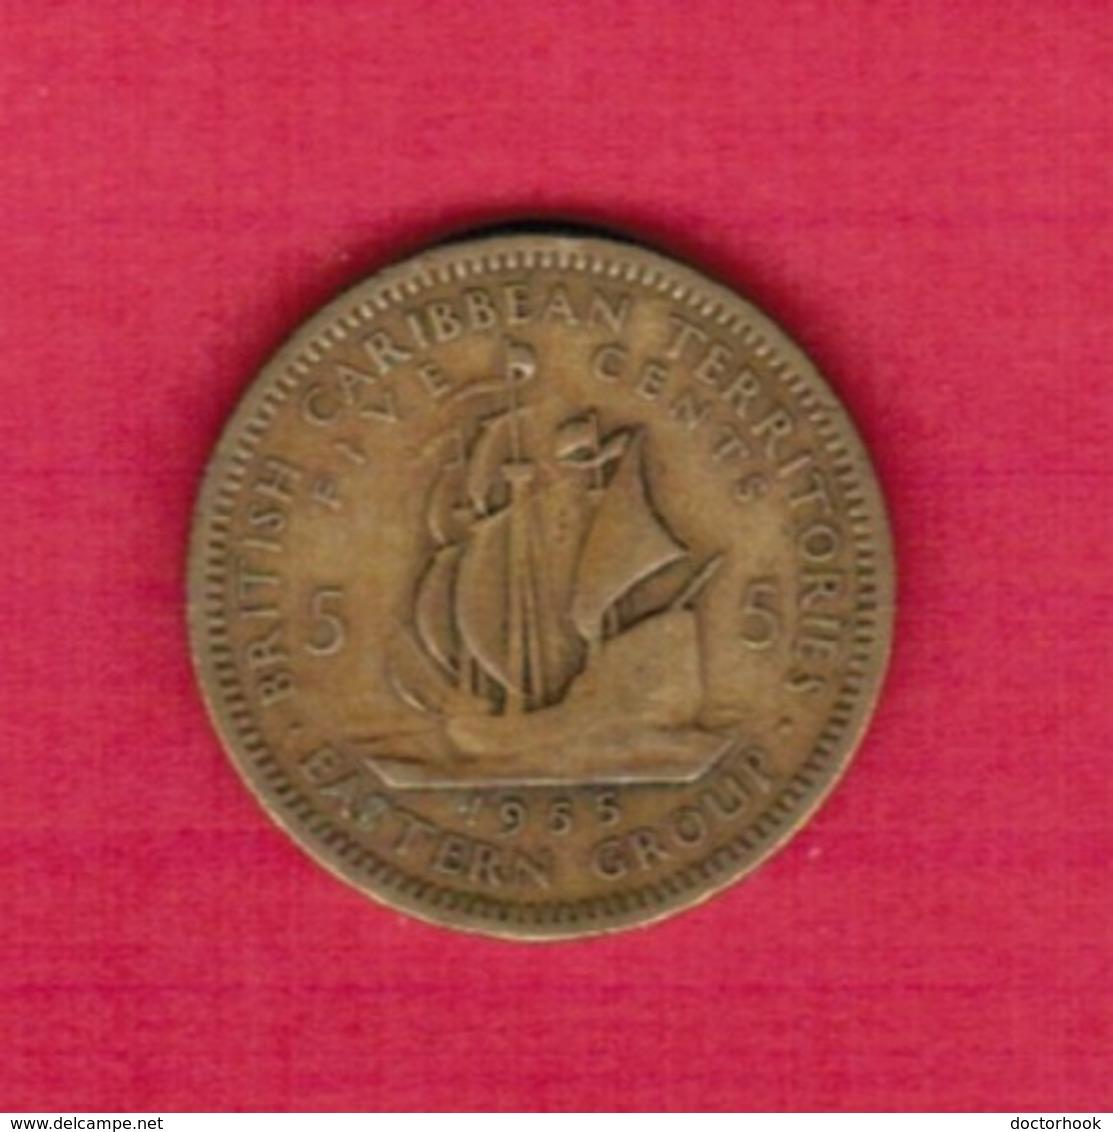 BRITISH CARIBBEAN TERRITORIES  5 CENTS 1955 (KM # 4) #5271 - Britse Caribische Gebieden